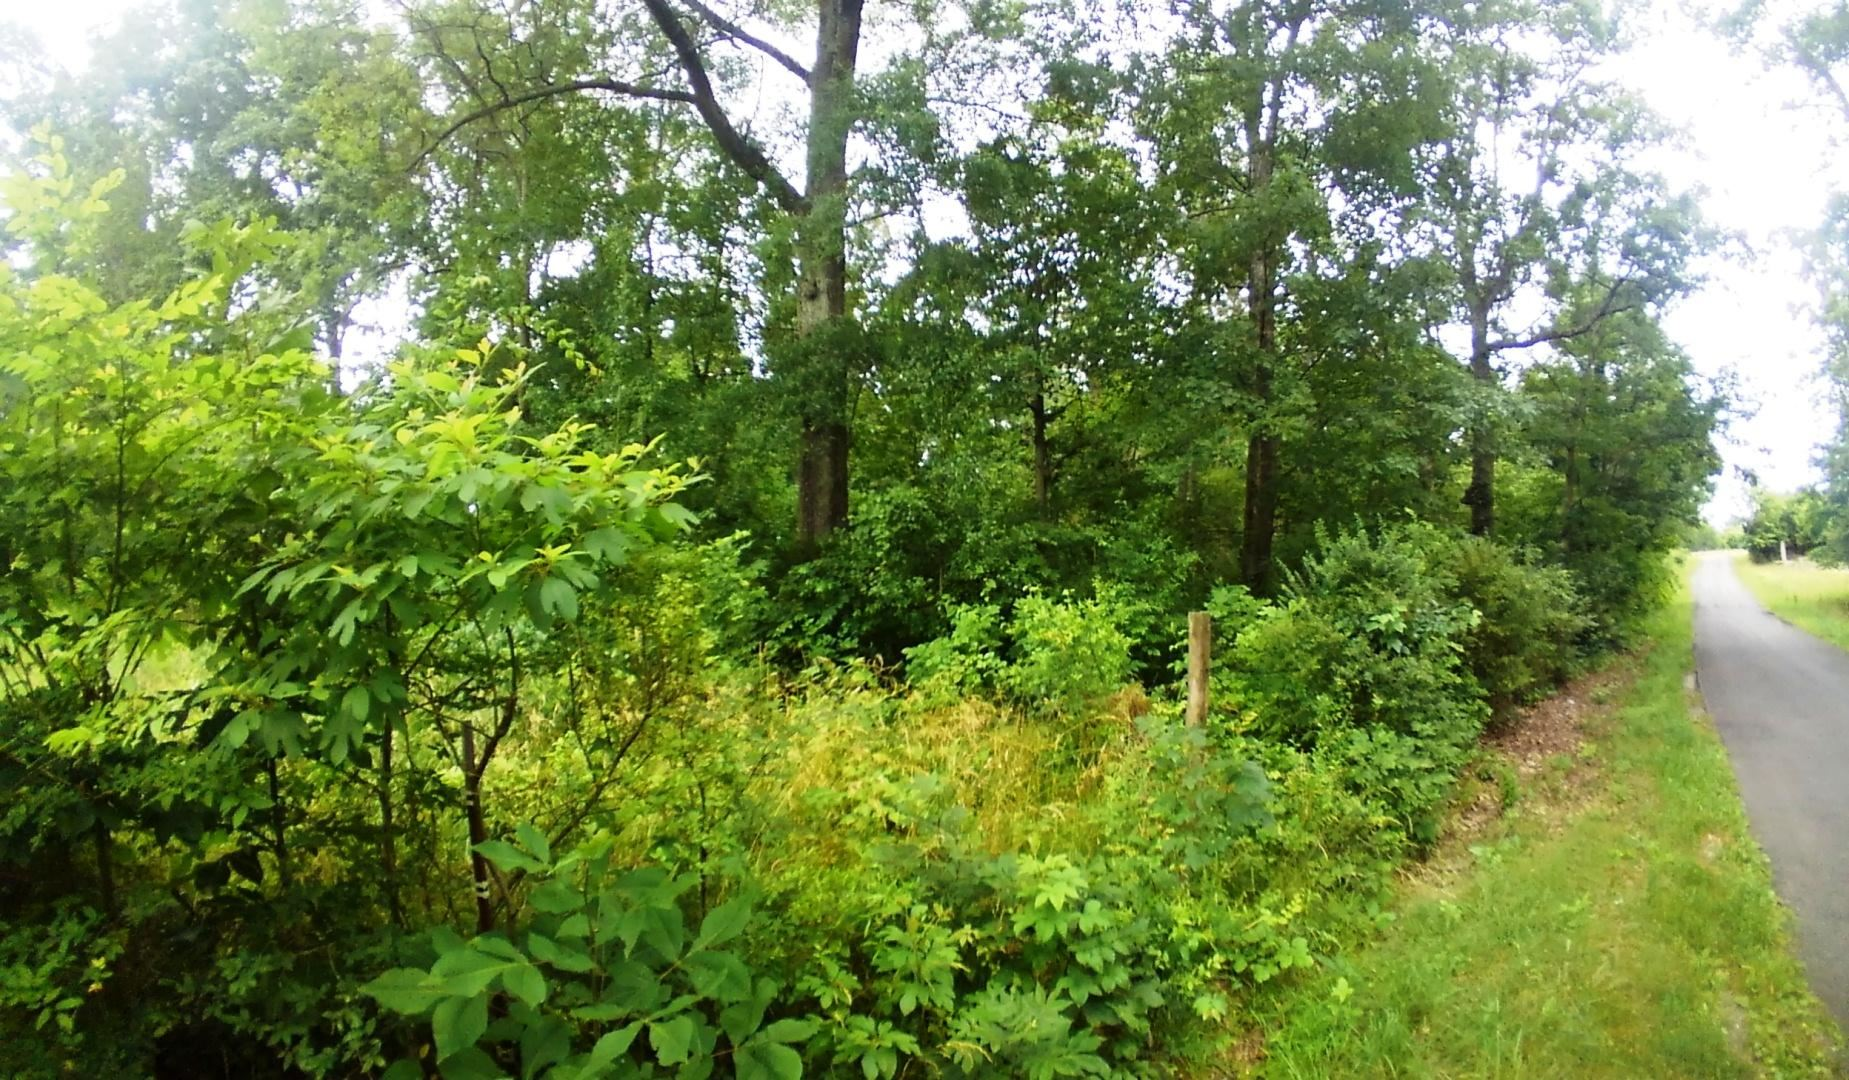 Photo of Lot 9 Smelcer Road, Mosheim, TN 37810 (MLS # 267366)